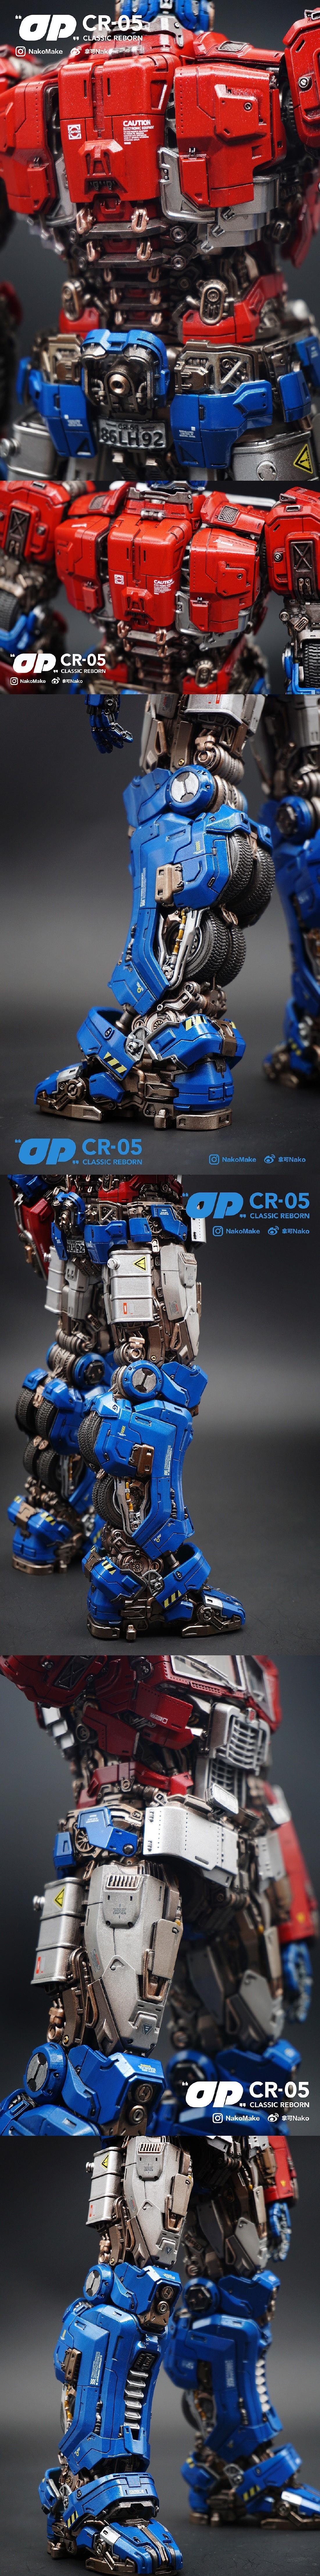 G798_NakoMake_Optimus_Prime_BUMBLEBEE_ver_GK_024_1.jpg